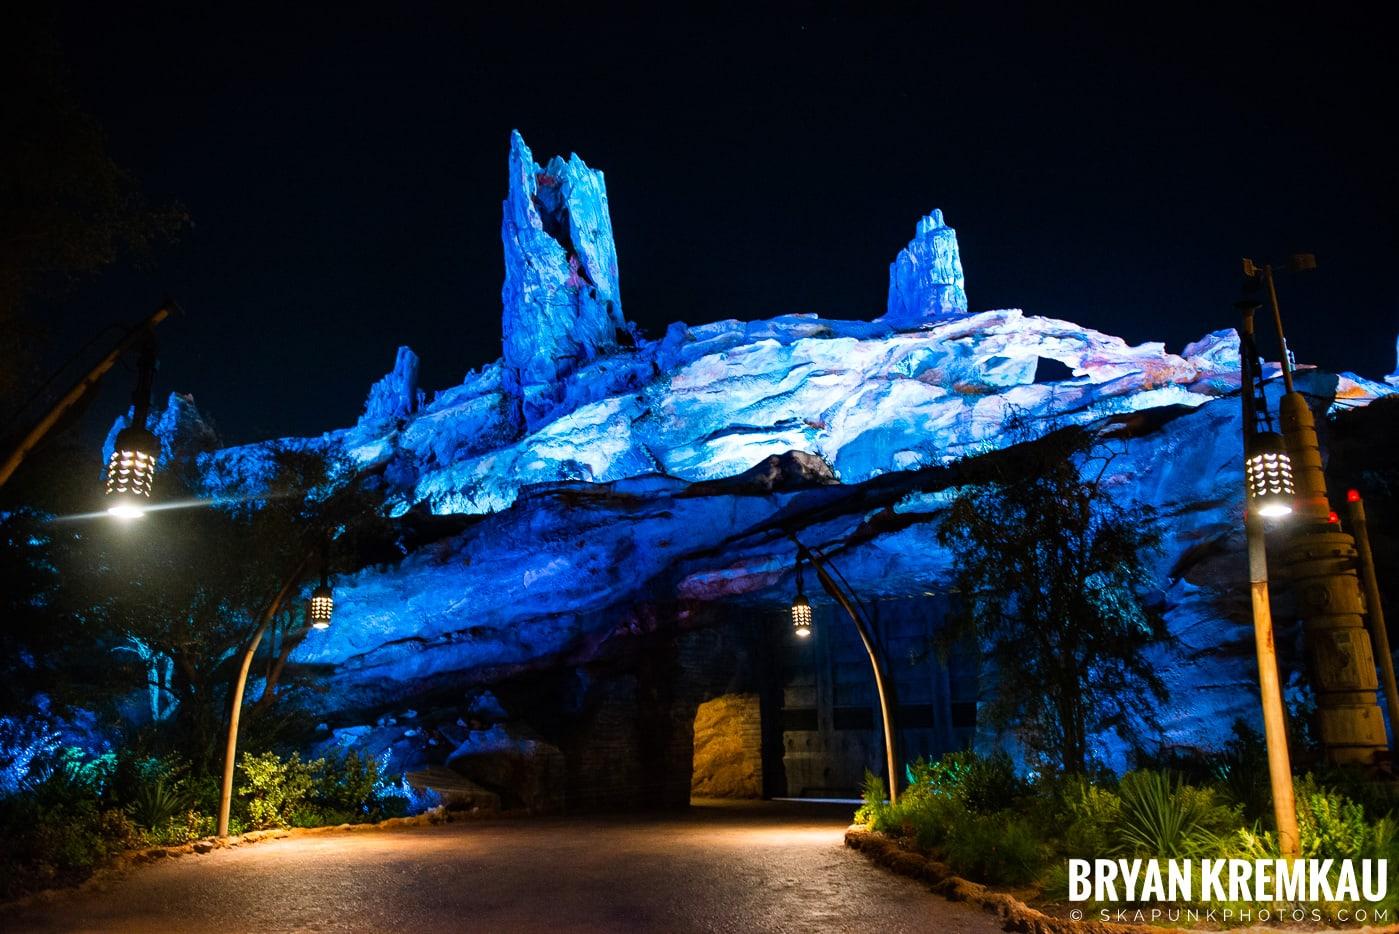 Walt Disney World Vacation: Day 5 (Animal Kingdom / Disney's Hollywood Studios) - 10.3.19 (38)